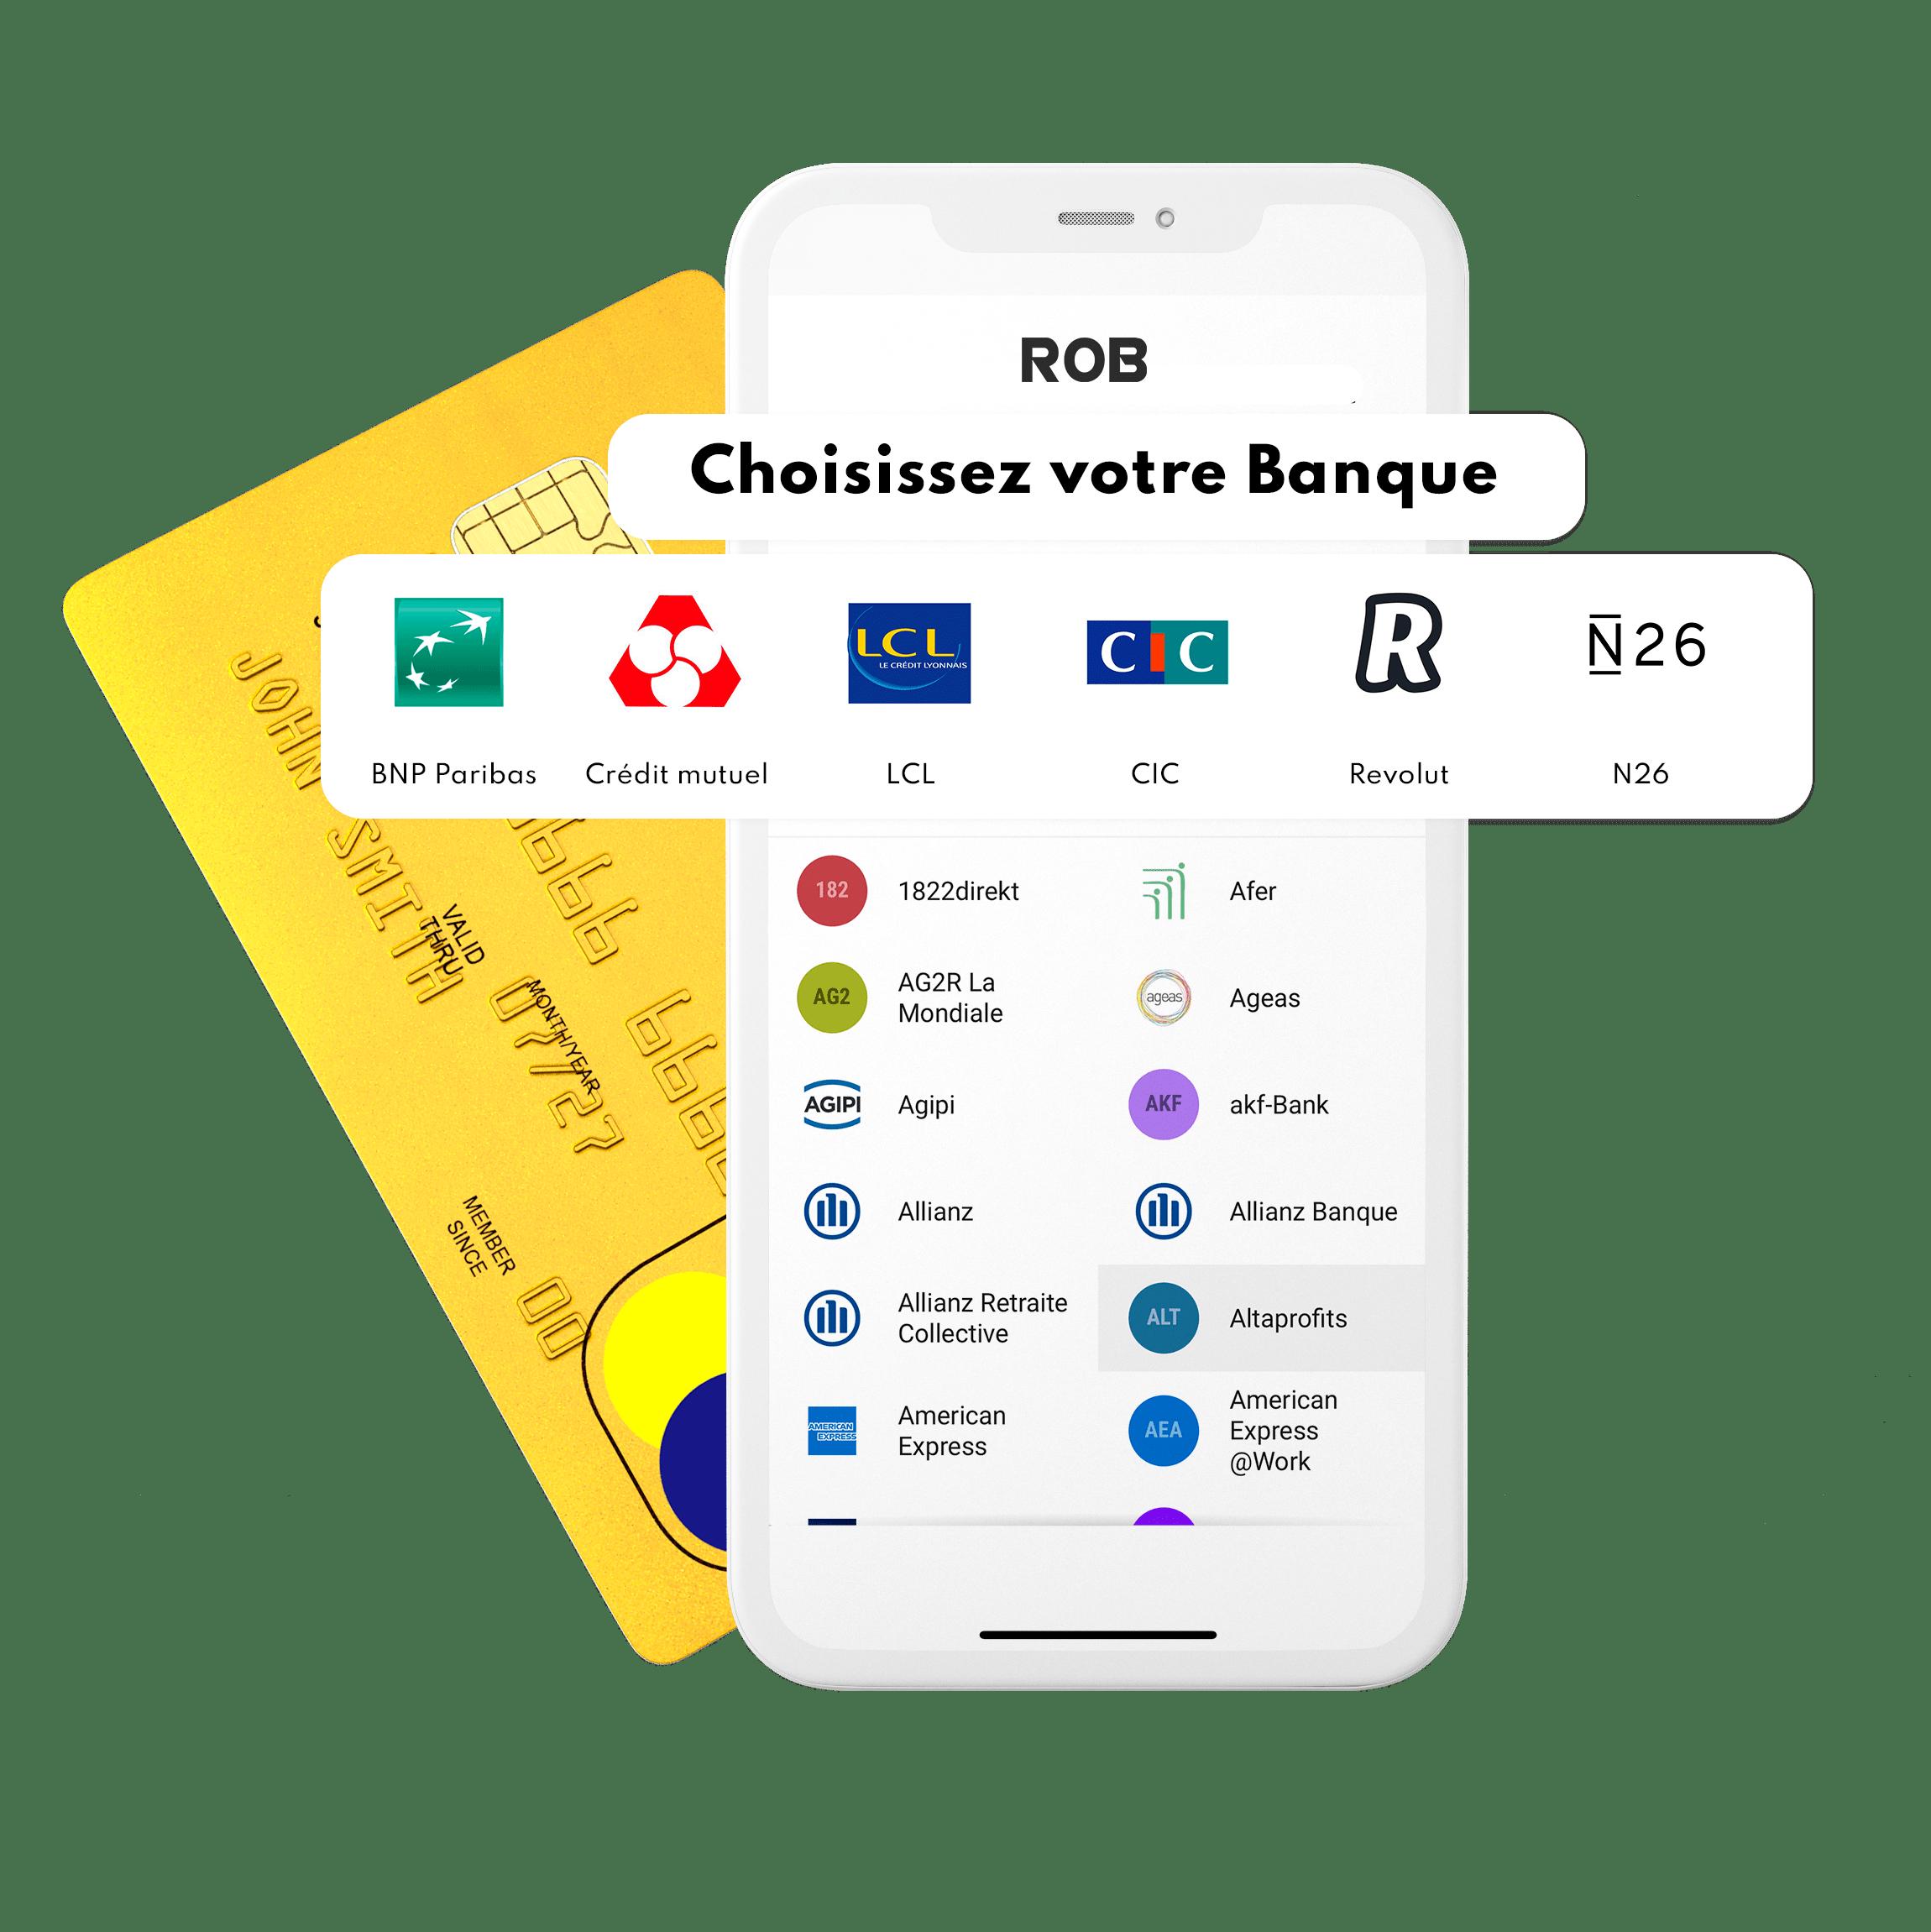 ROB carte bancaire